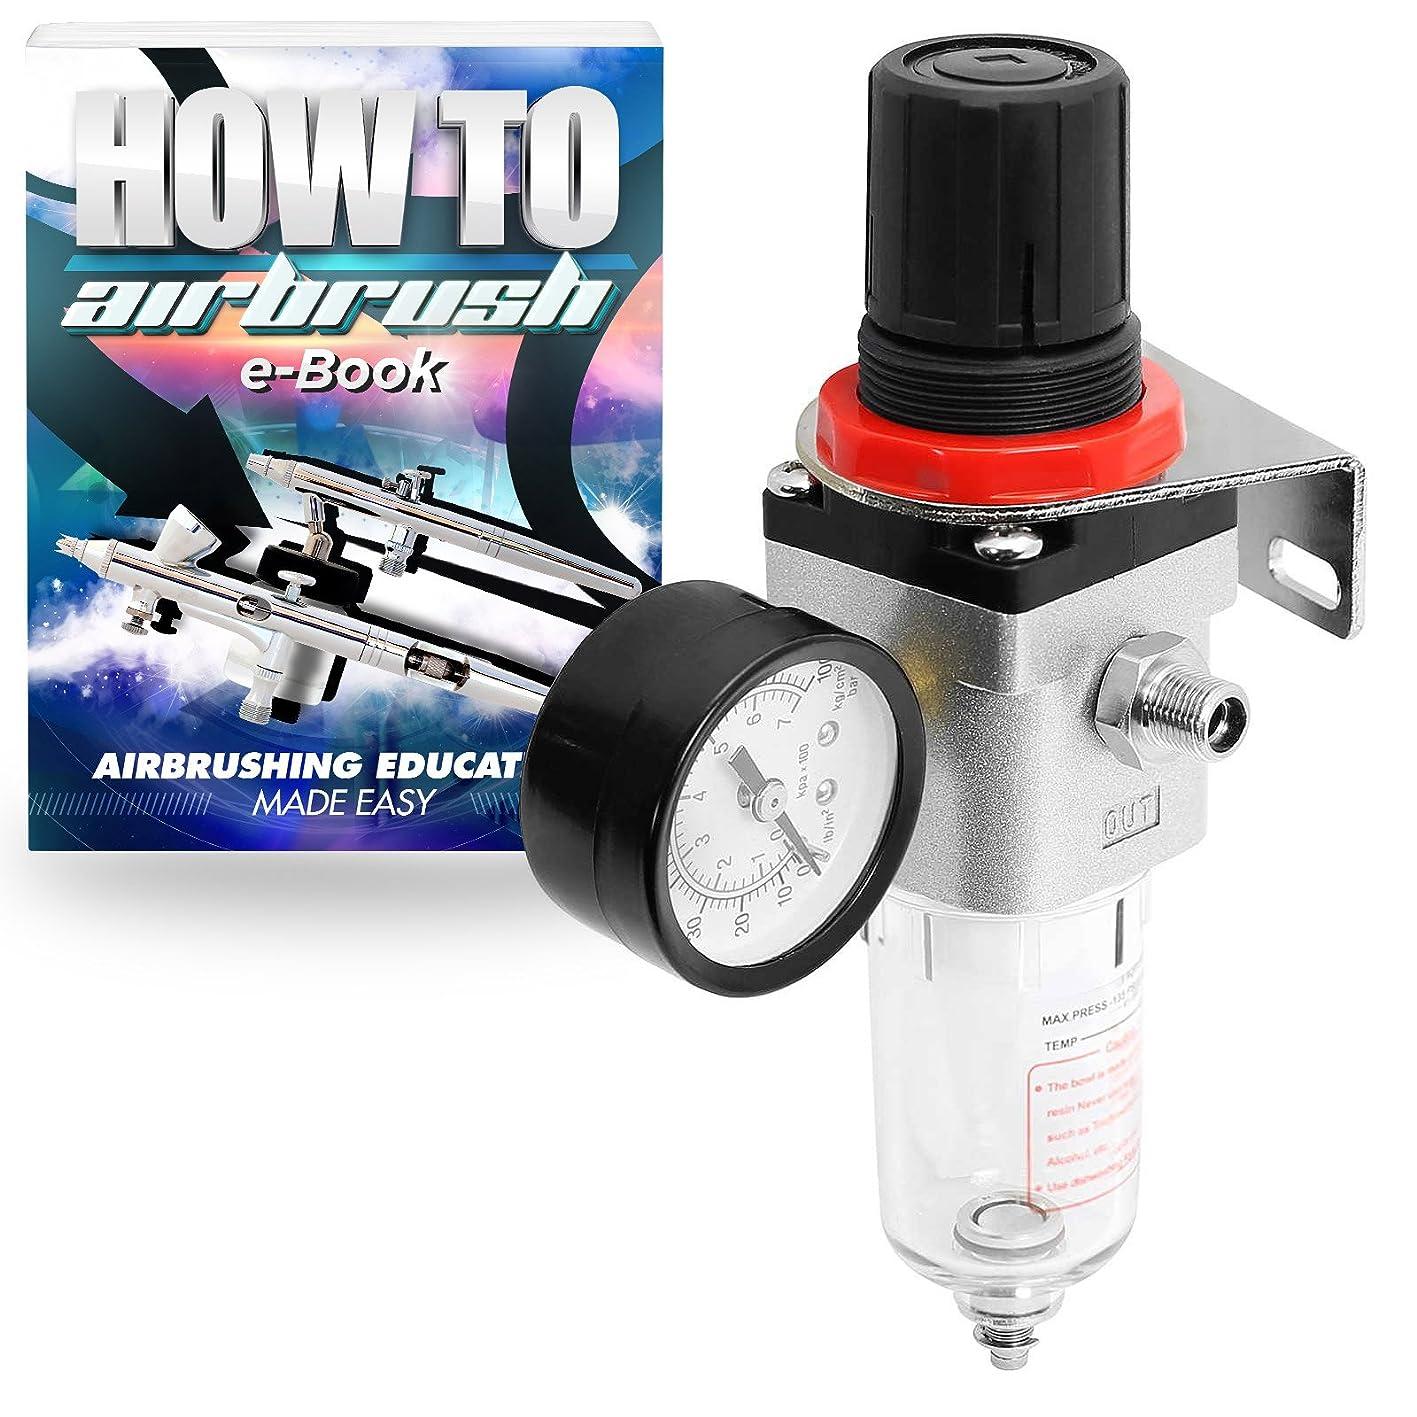 PointZero Pro Airbrush Air Compressor Regulator with Water-Trap Filter xifossmzfgx890